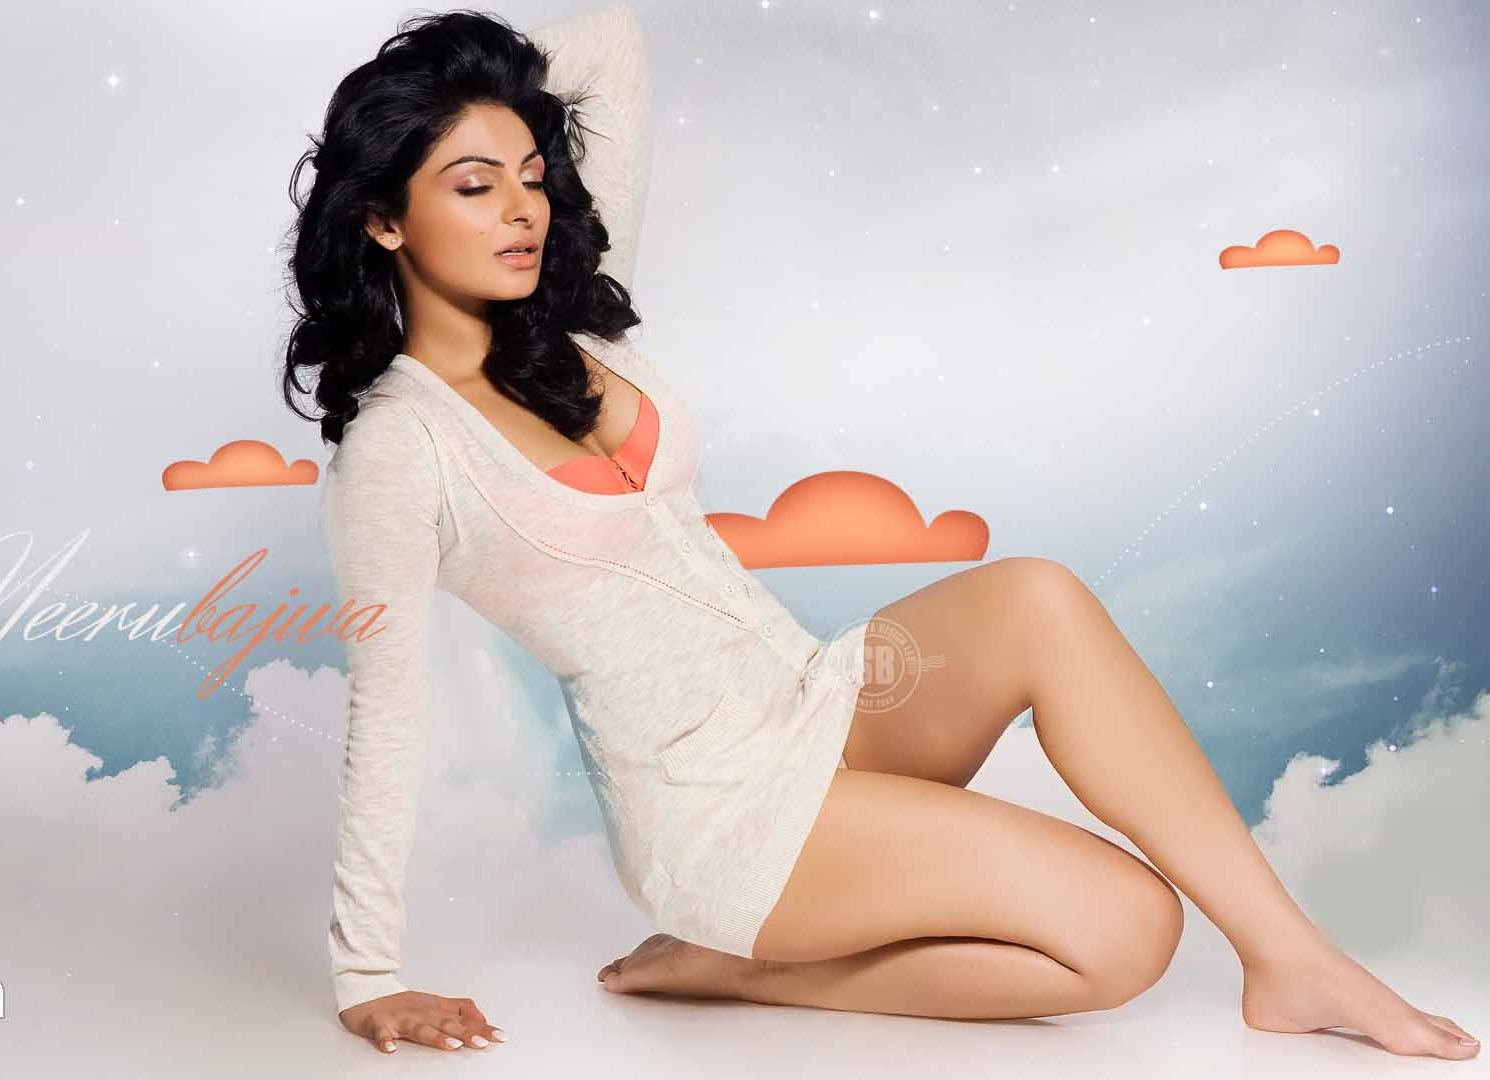 Awesome Actress Photos Neeru Bajwa Spicy Hot Thighs-8177